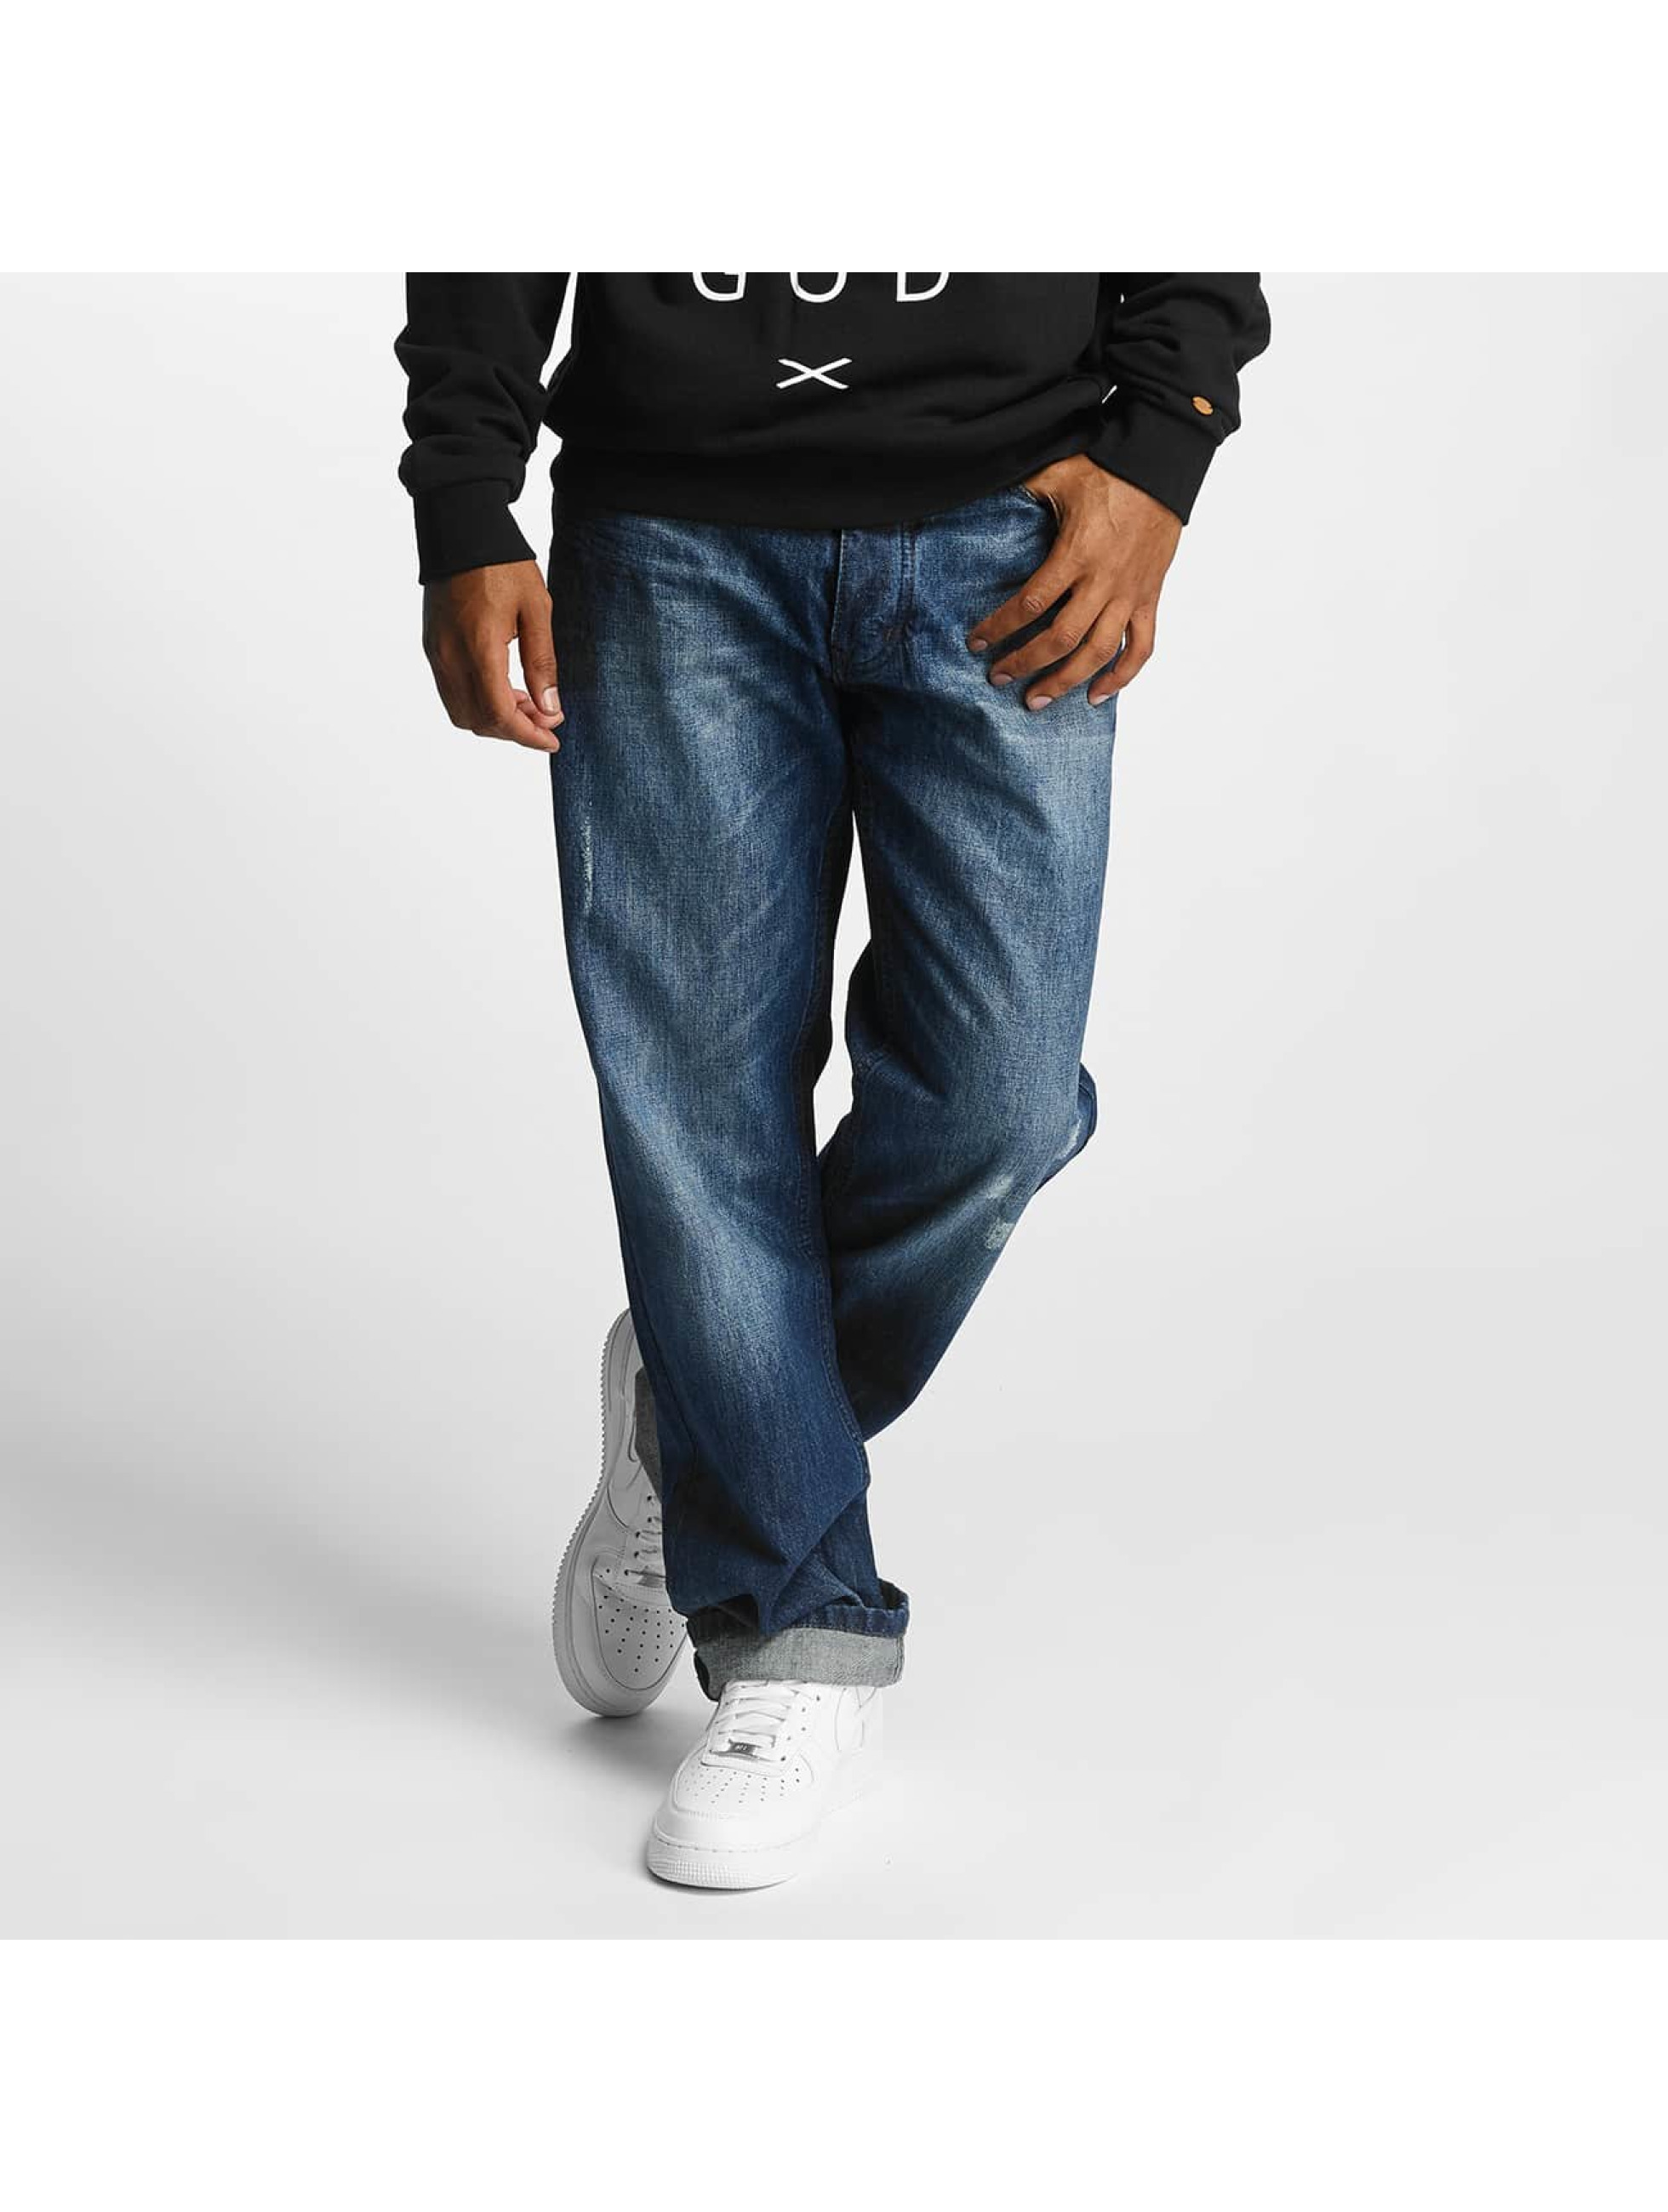 Rocawear / Loose Fit Jeans Loose Fit J in blue W 42